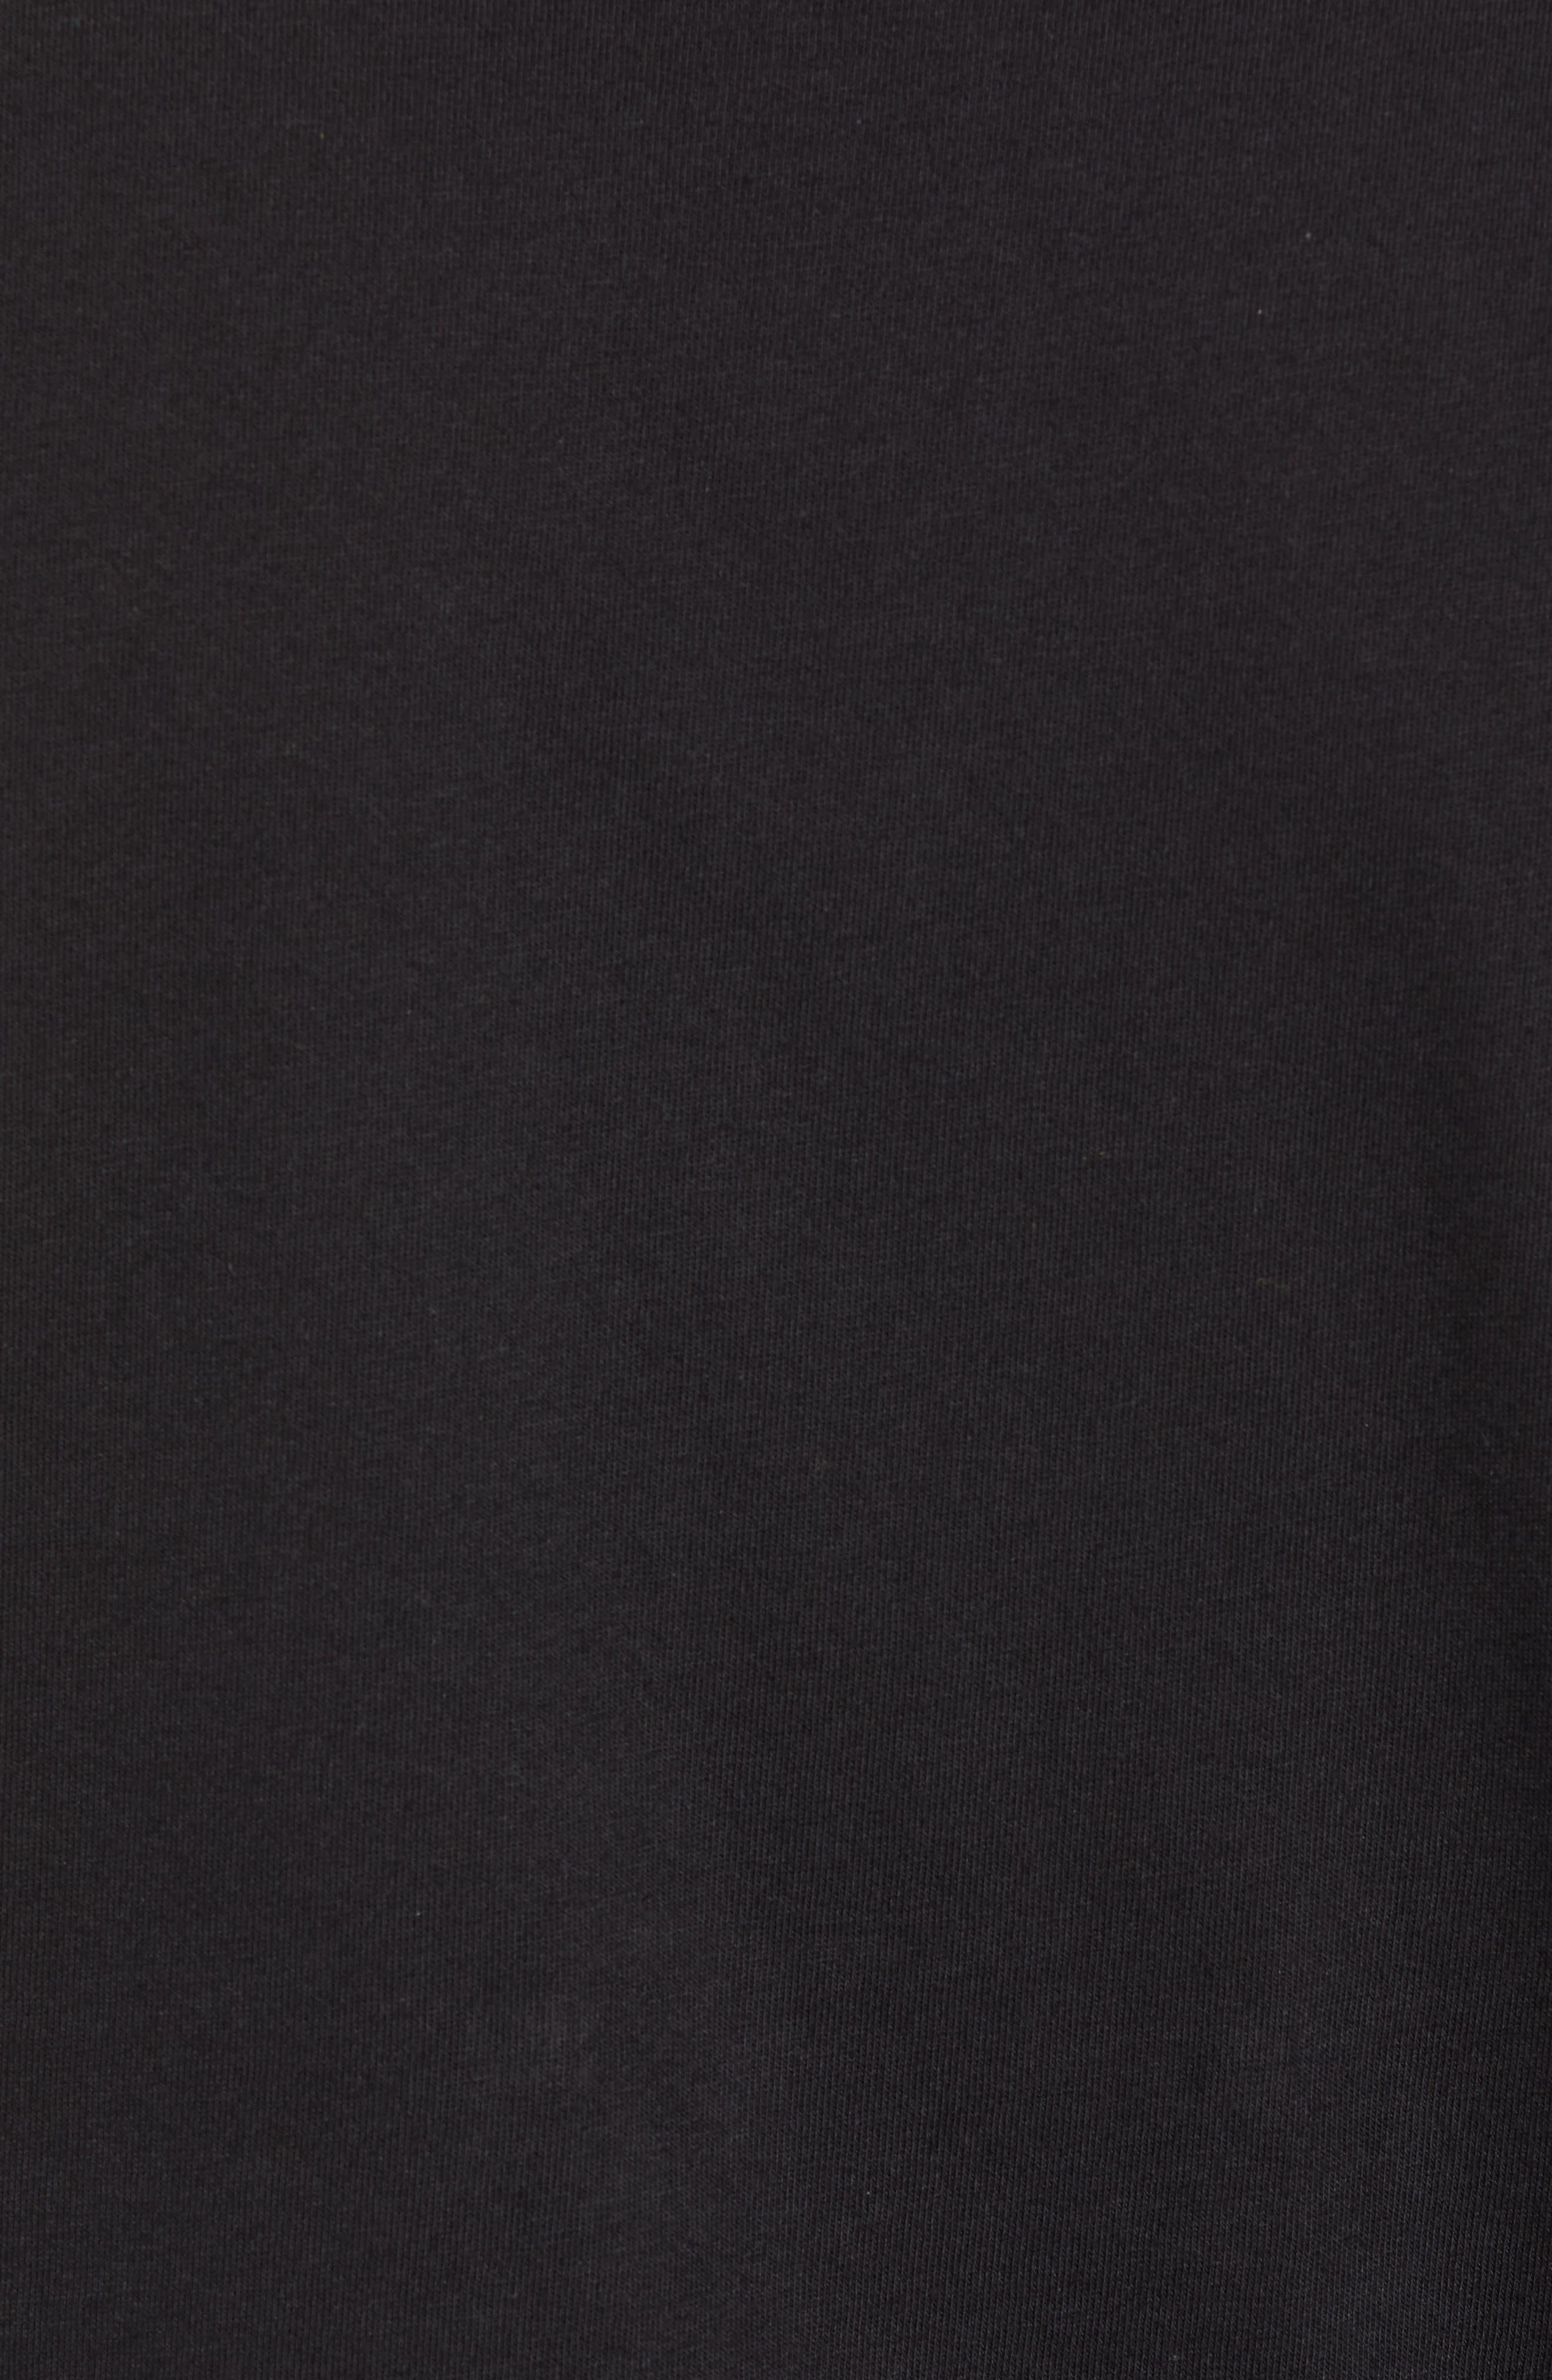 Community Sleeveless T-Shirt,                             Alternate thumbnail 5, color,                             RAINBOW GRADIENT BLACK